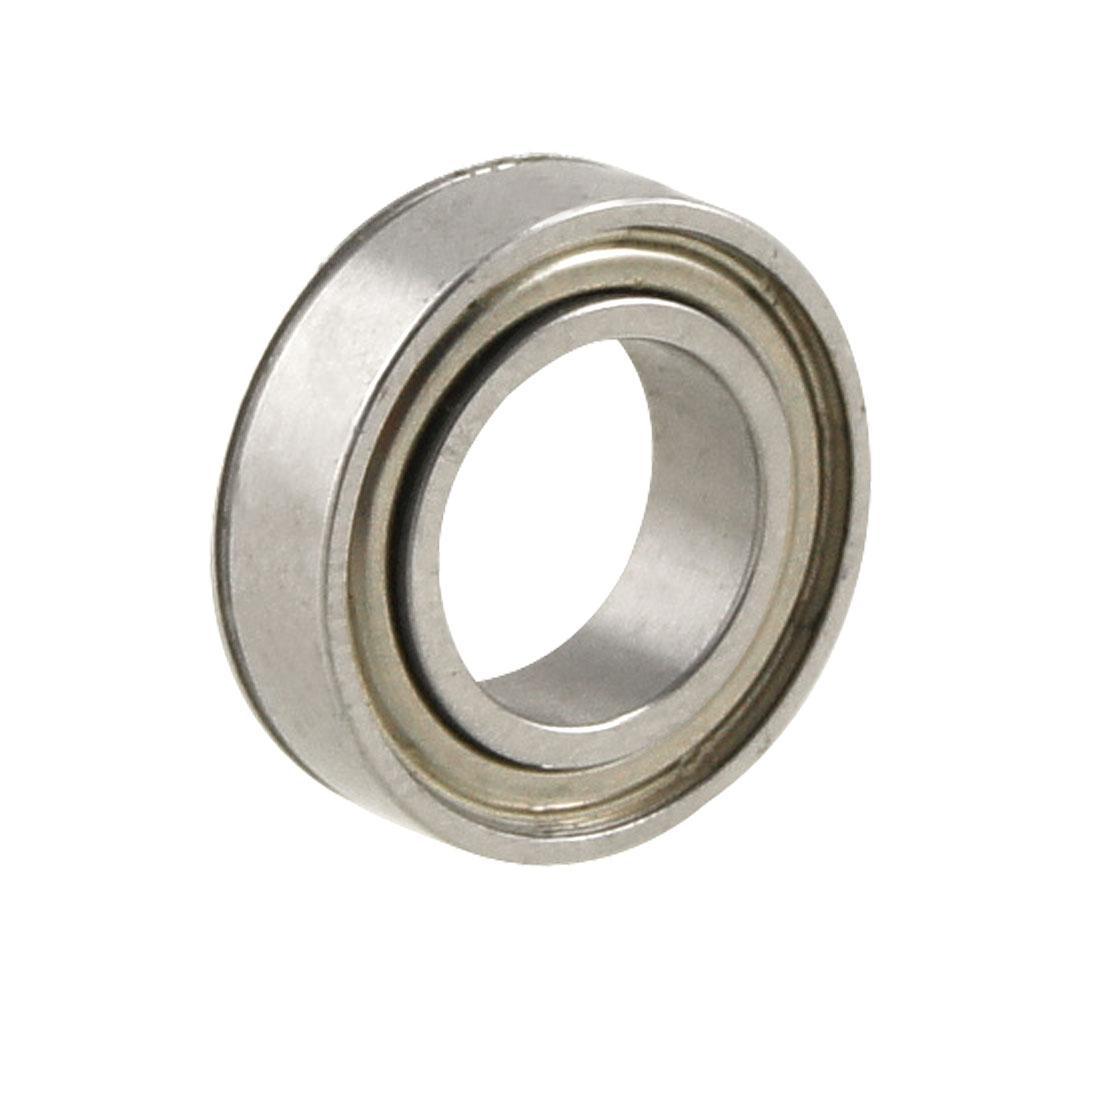 Silver Tone Metal 8mm x 14mm x 4mm Shield Ball Bearing